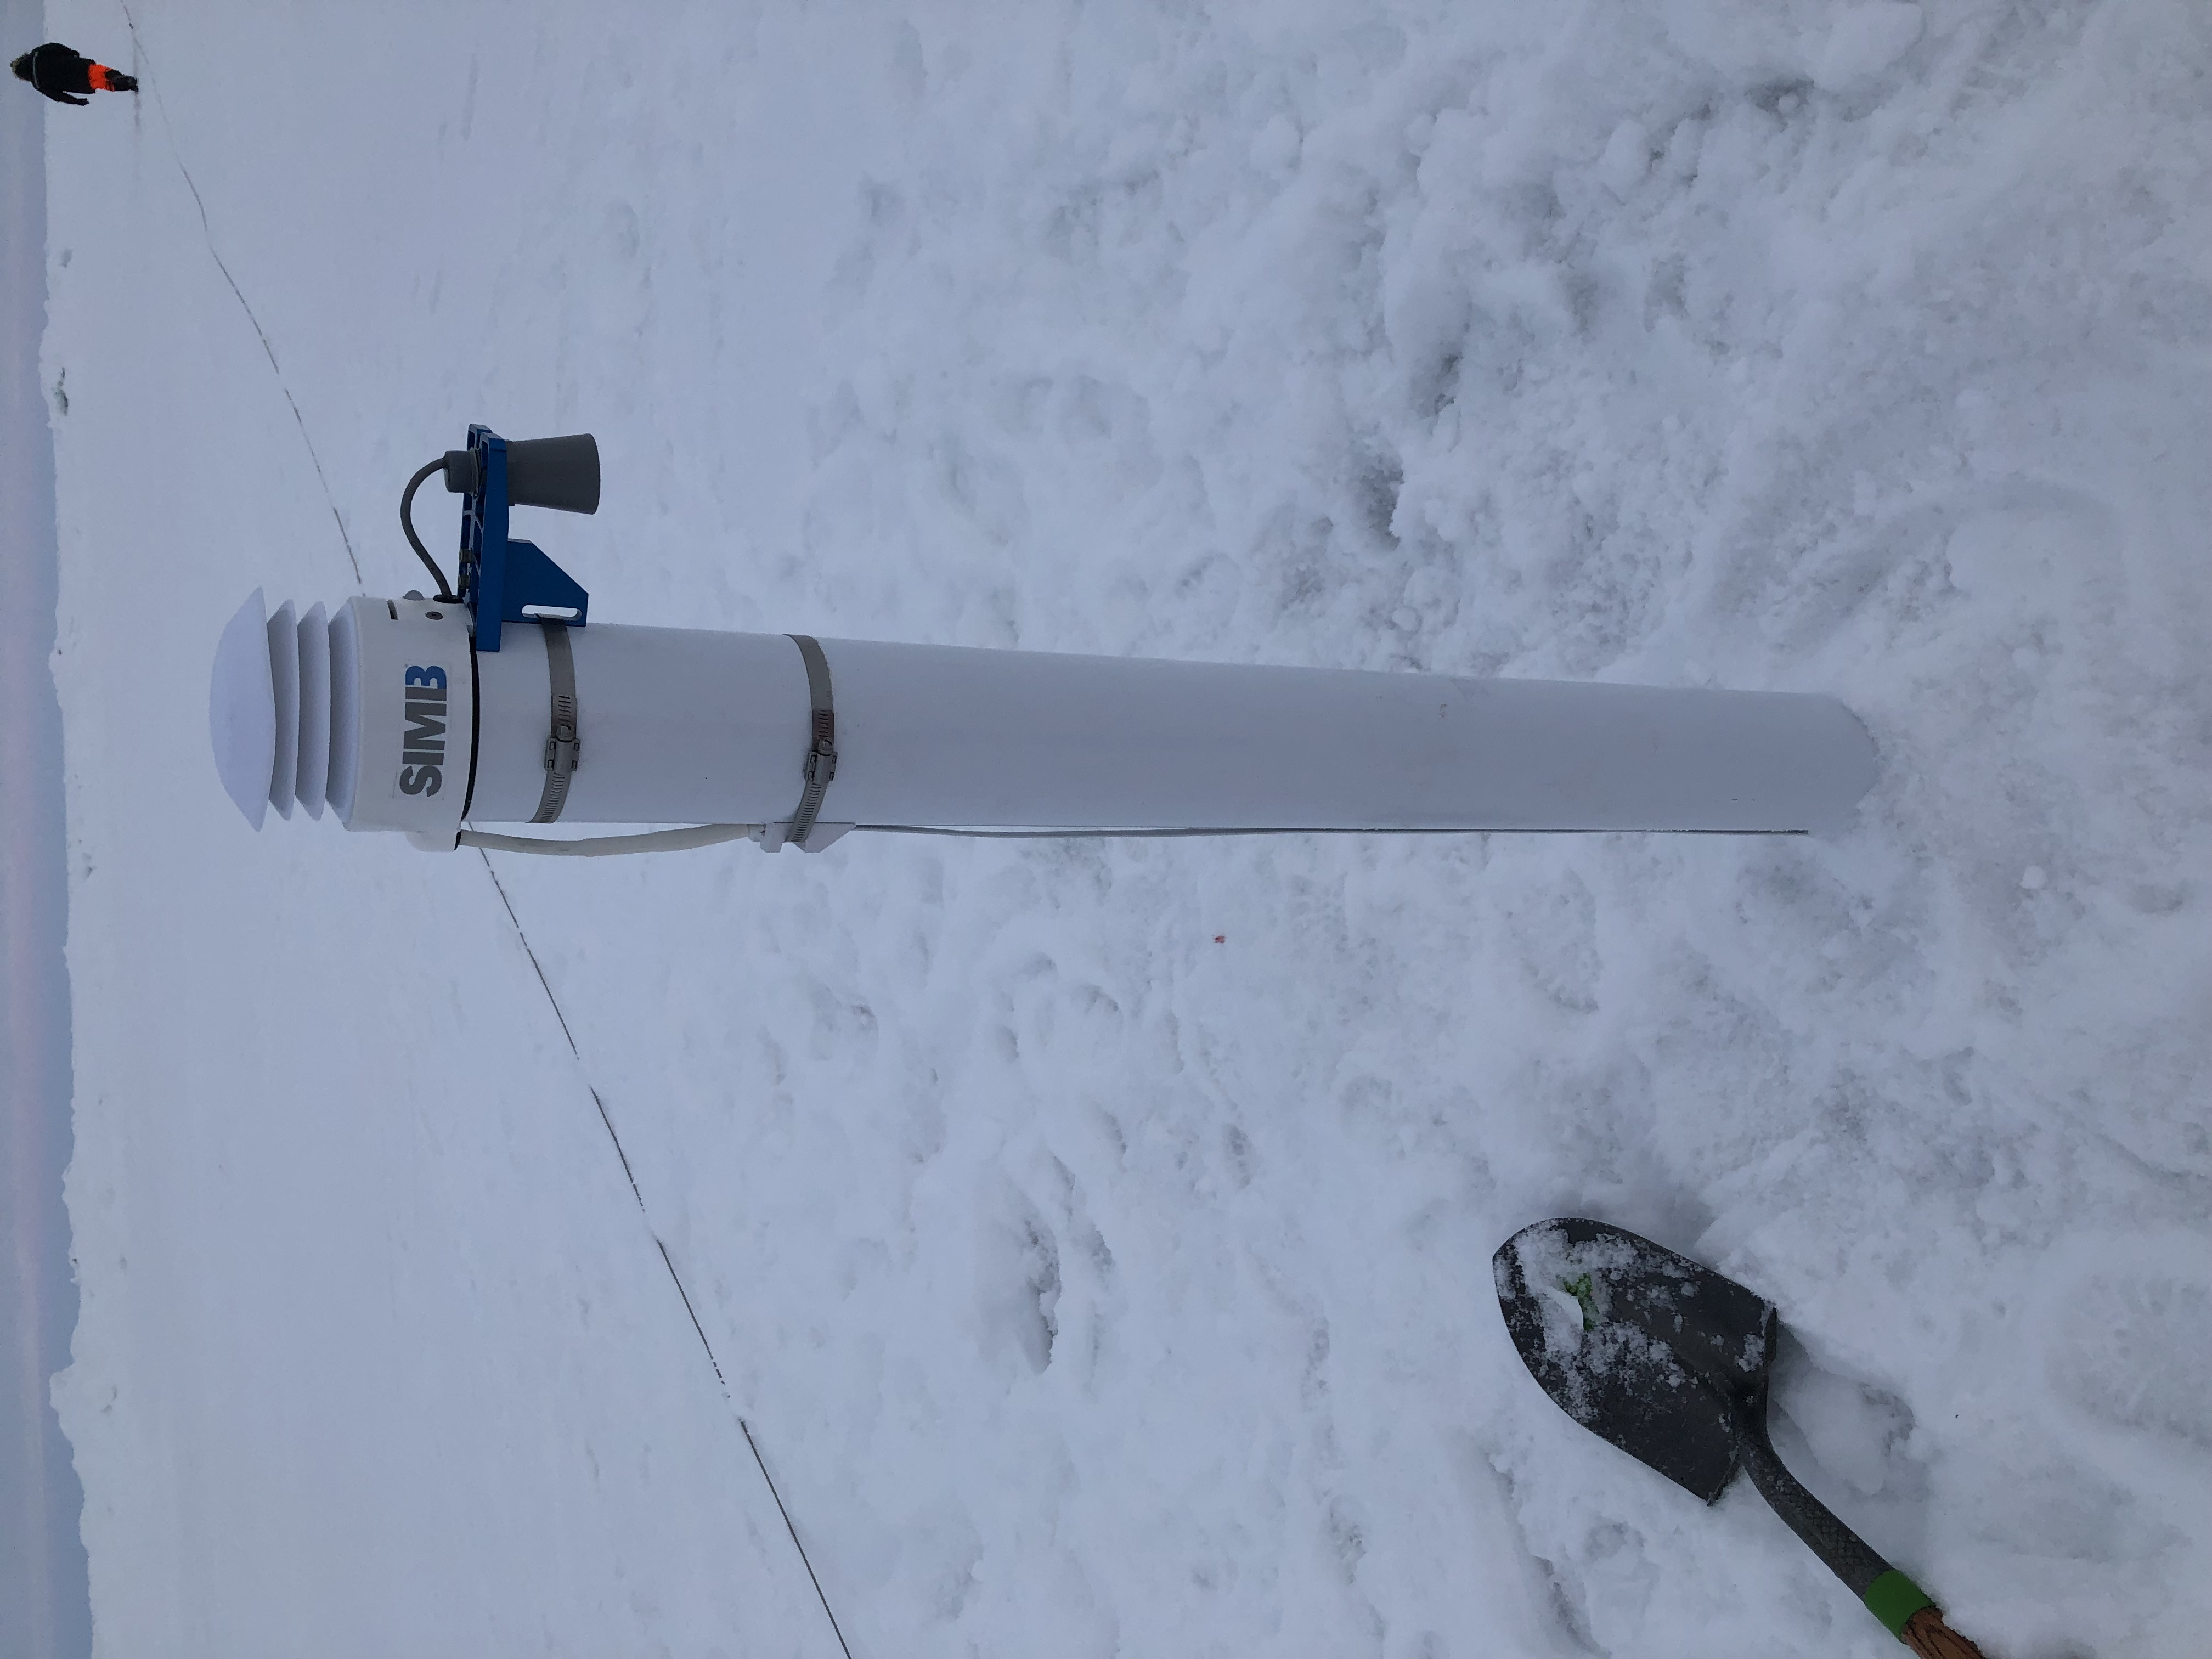 SIMB3 deployed in ice  on MOSAiC